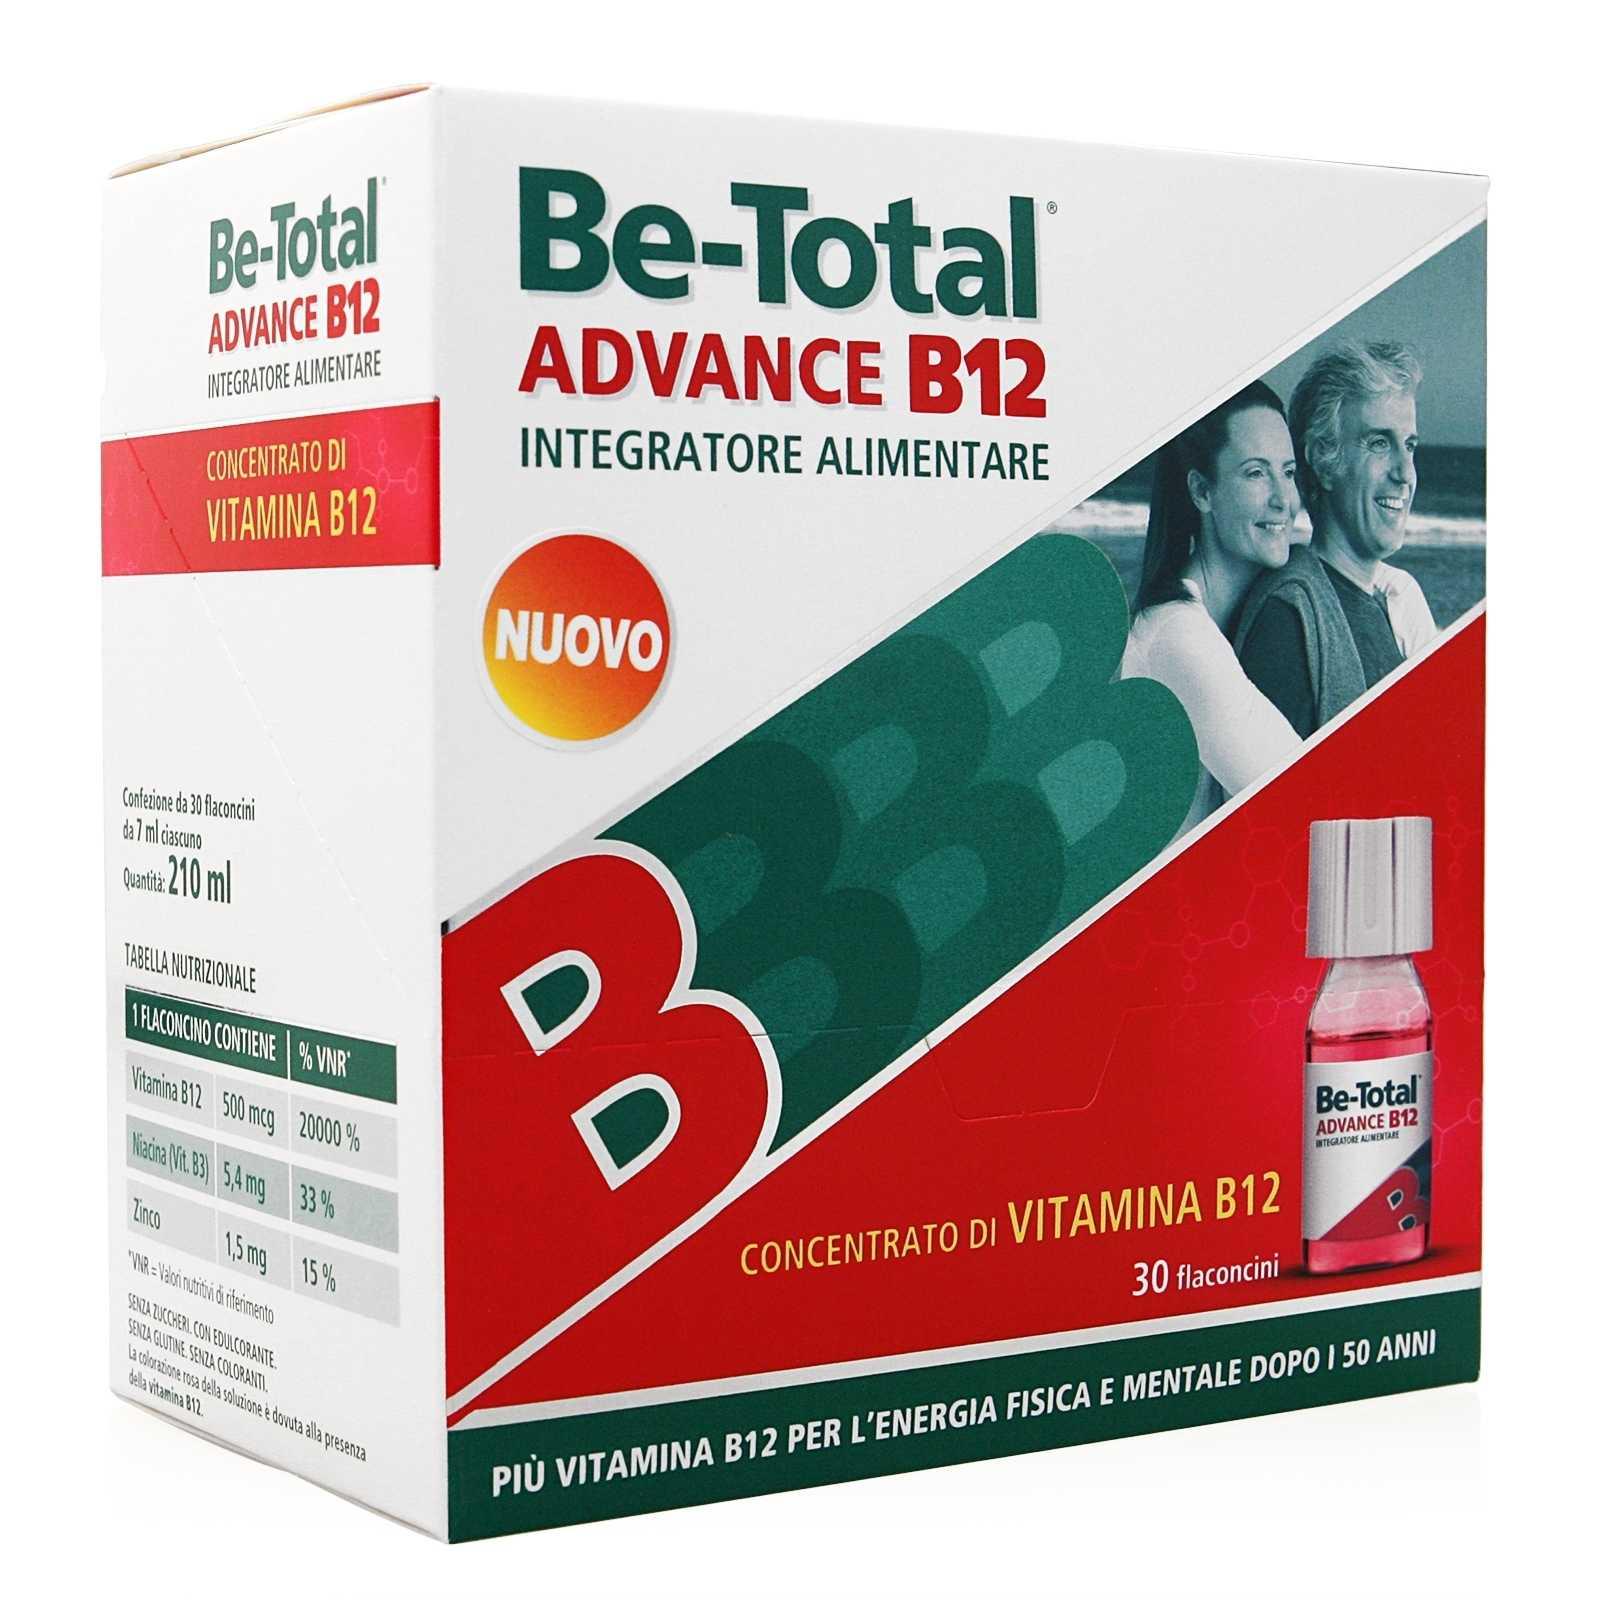 Be-total Advance B12 -  30 Flaconcini